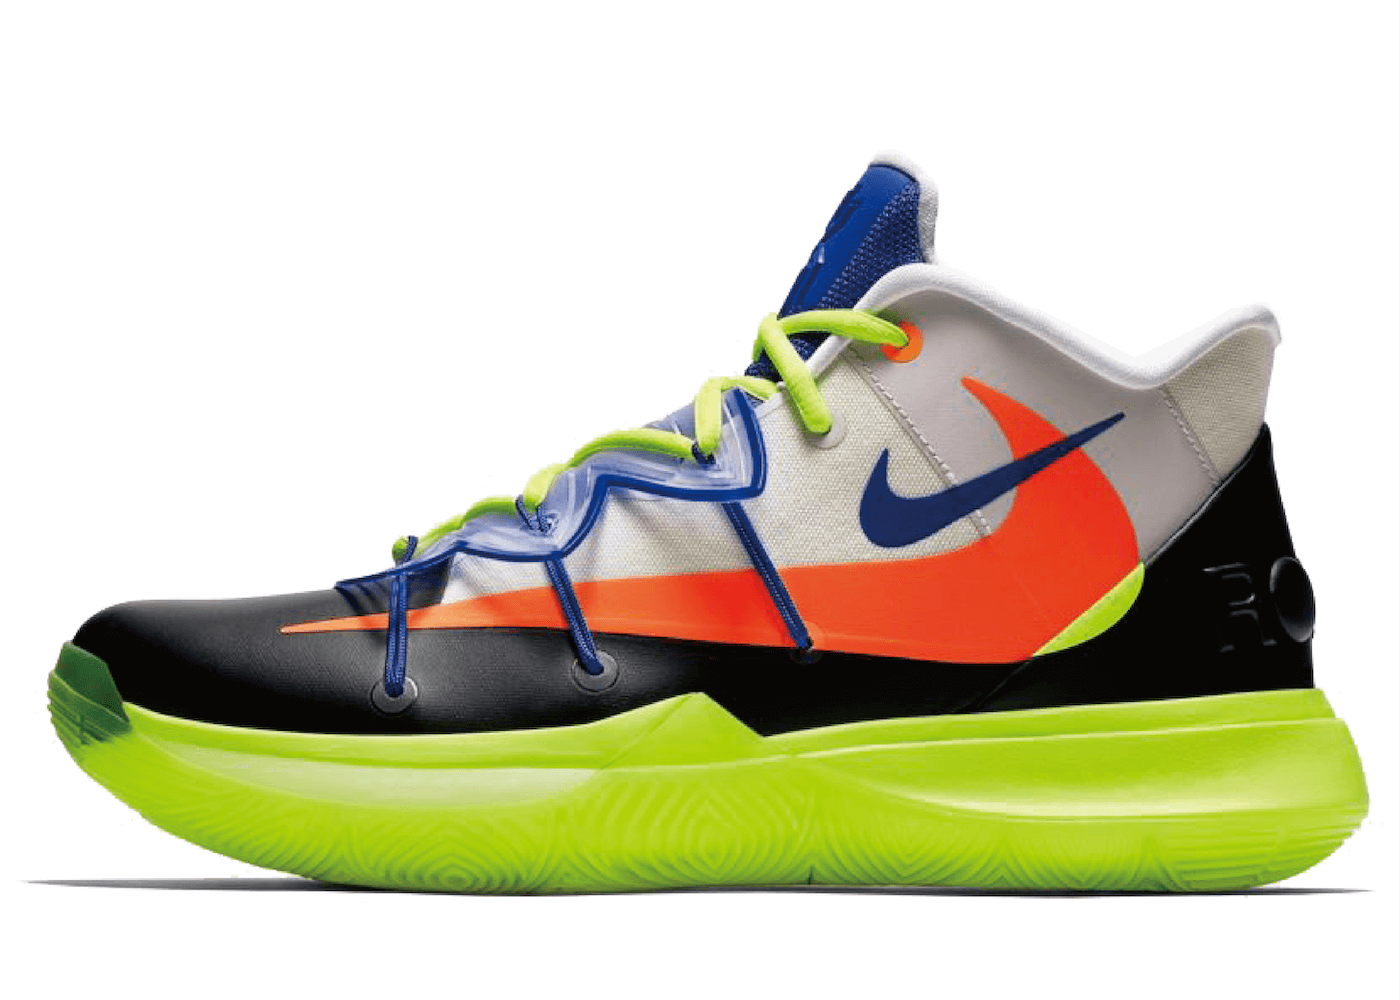 Nike Kyrie 5 Rokitの写真